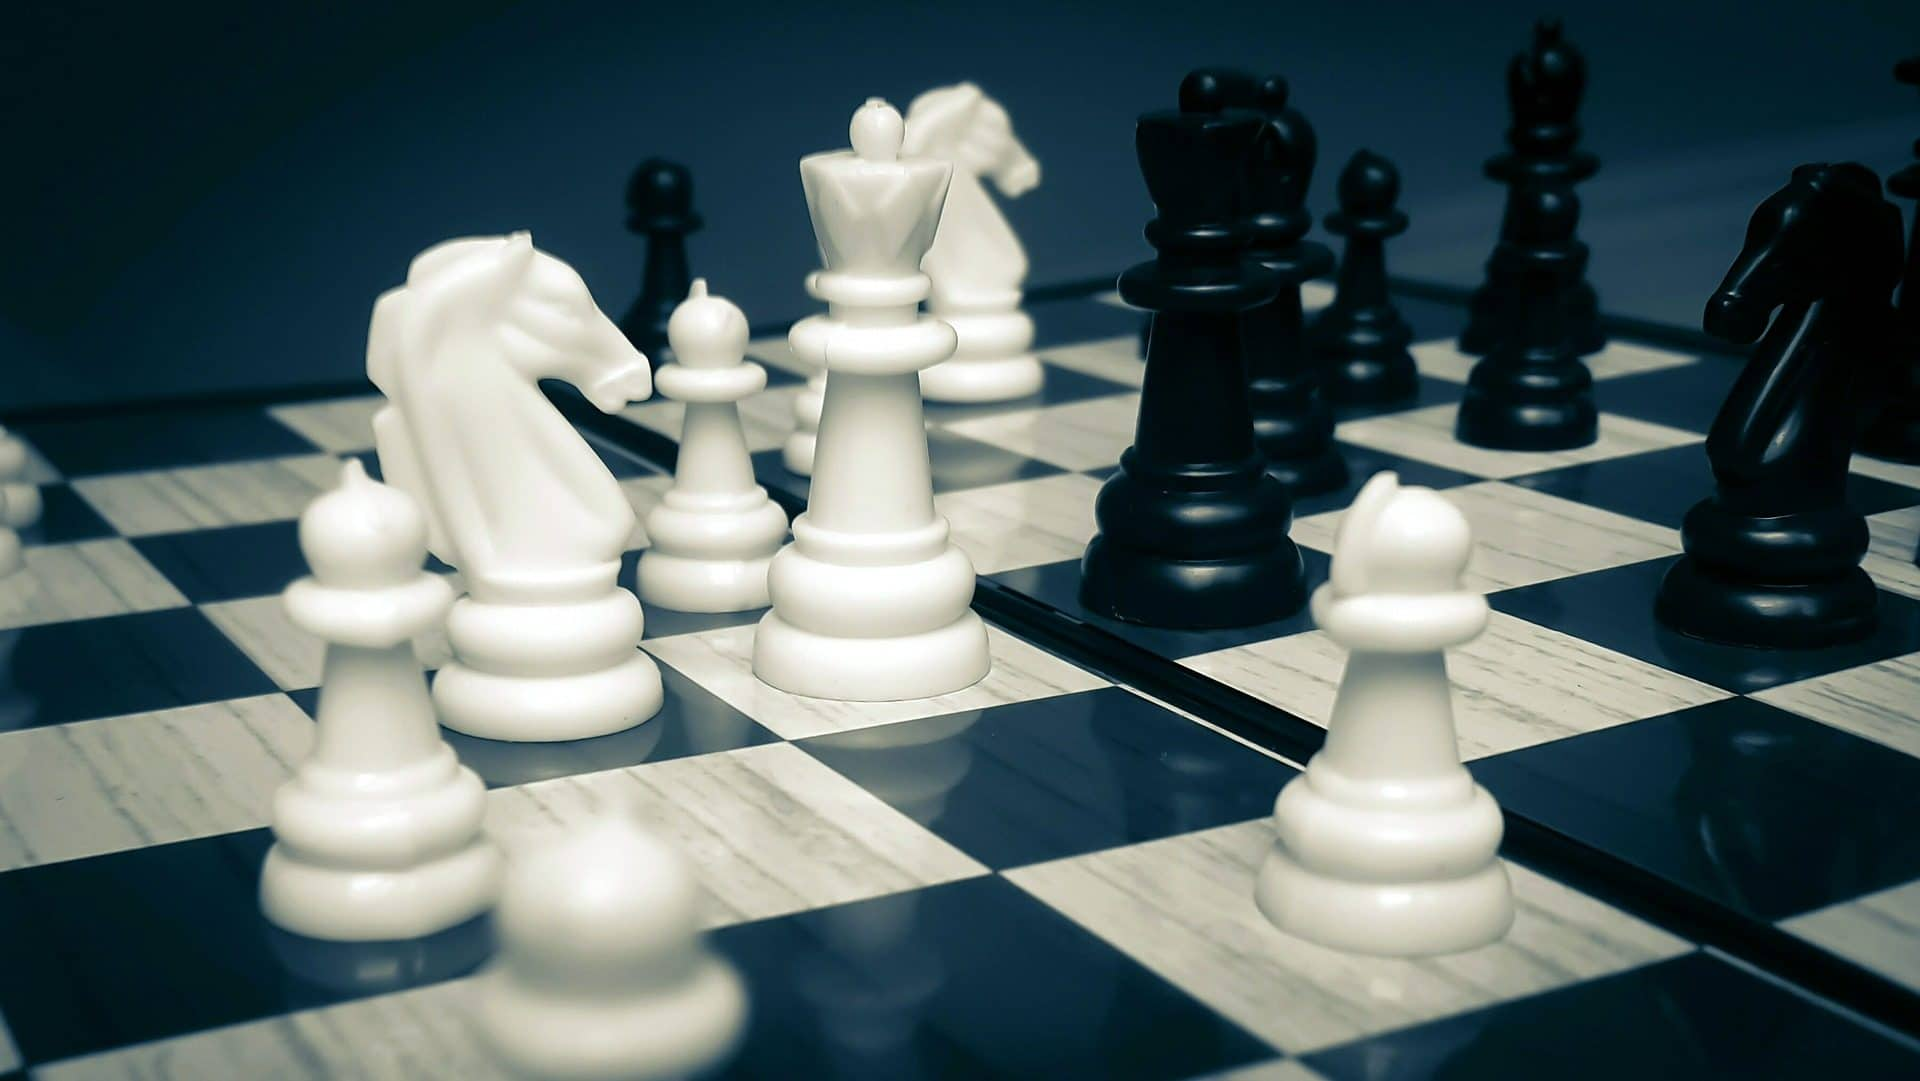 ajedrez-piezas-tablero